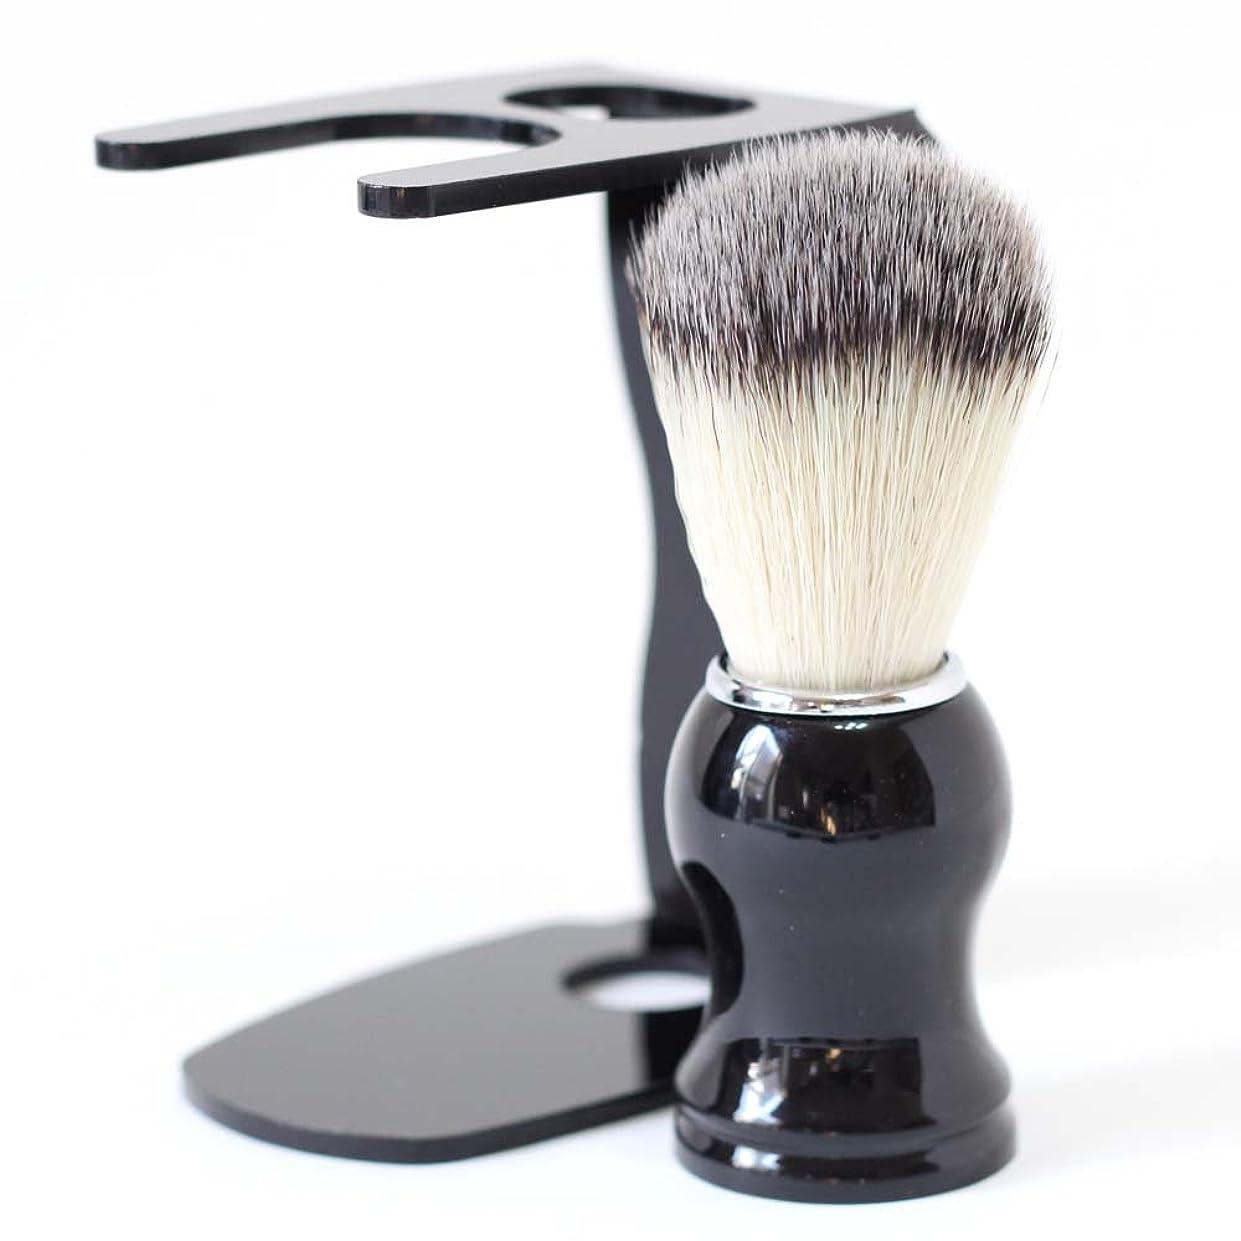 【Barsado】泡立ちが違う 100% アナグマ 毛 シェービング ブラシ スタンド付き/理容 洗顔 髭剃り マッサージ 効果